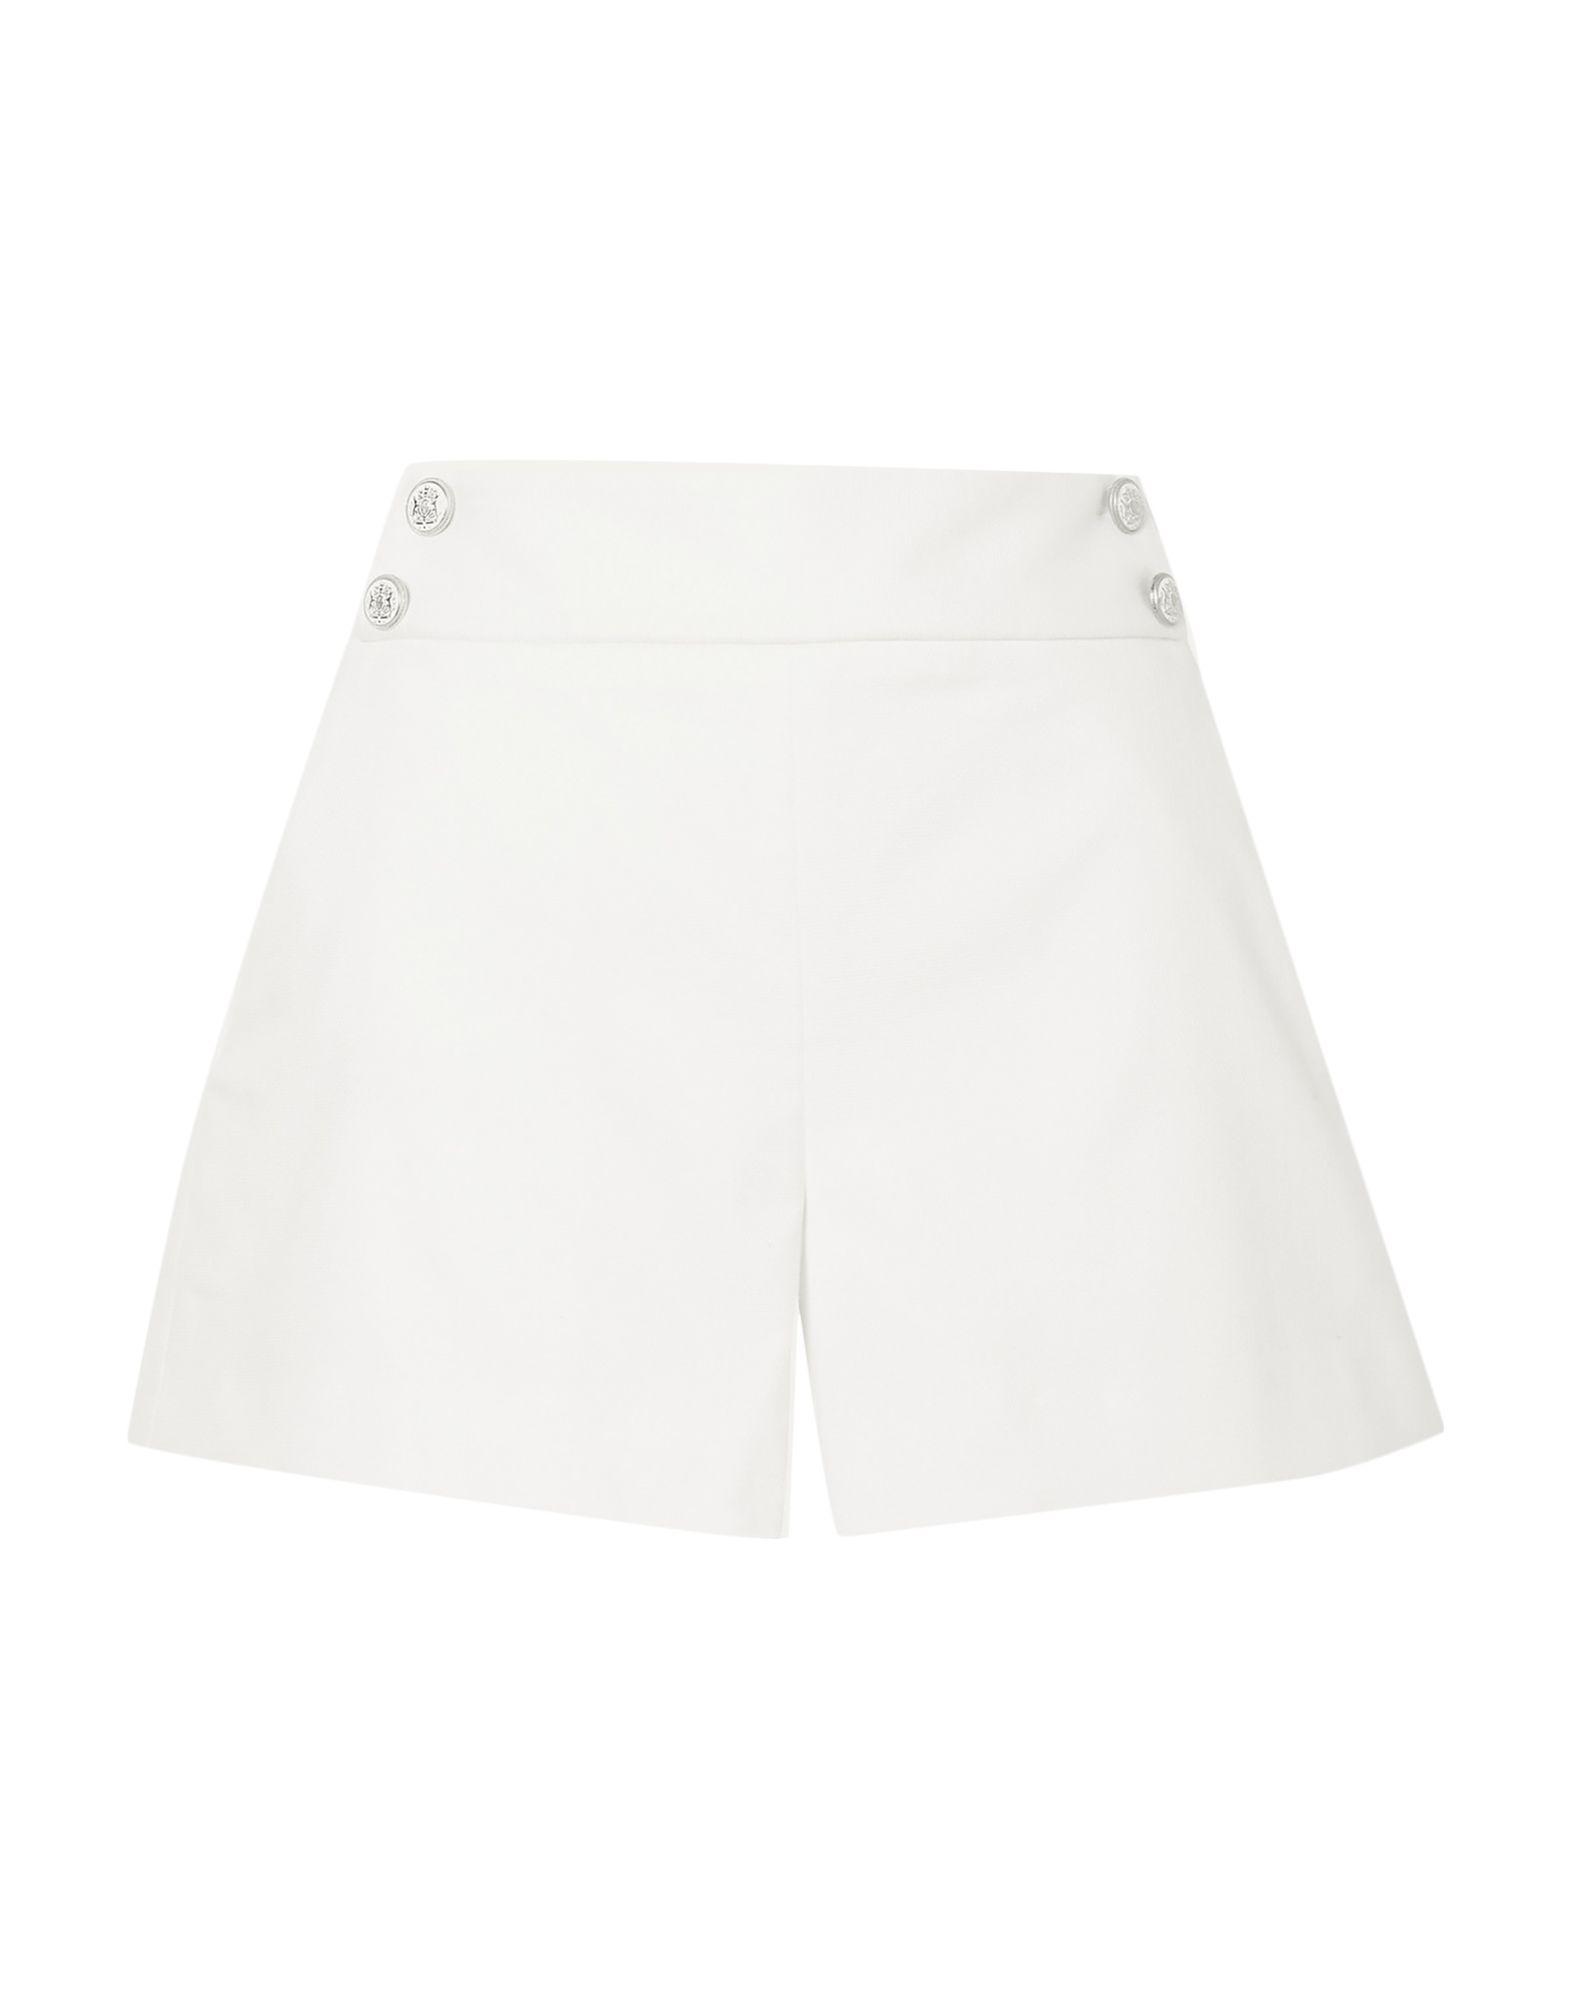 VERONICA BEARD Shorts. canvas, solid color, no appliqués, mid rise, hook-and-bar, zip, multipockets, stretch. 54% Cotton, 43% Modal, 3% Elastane